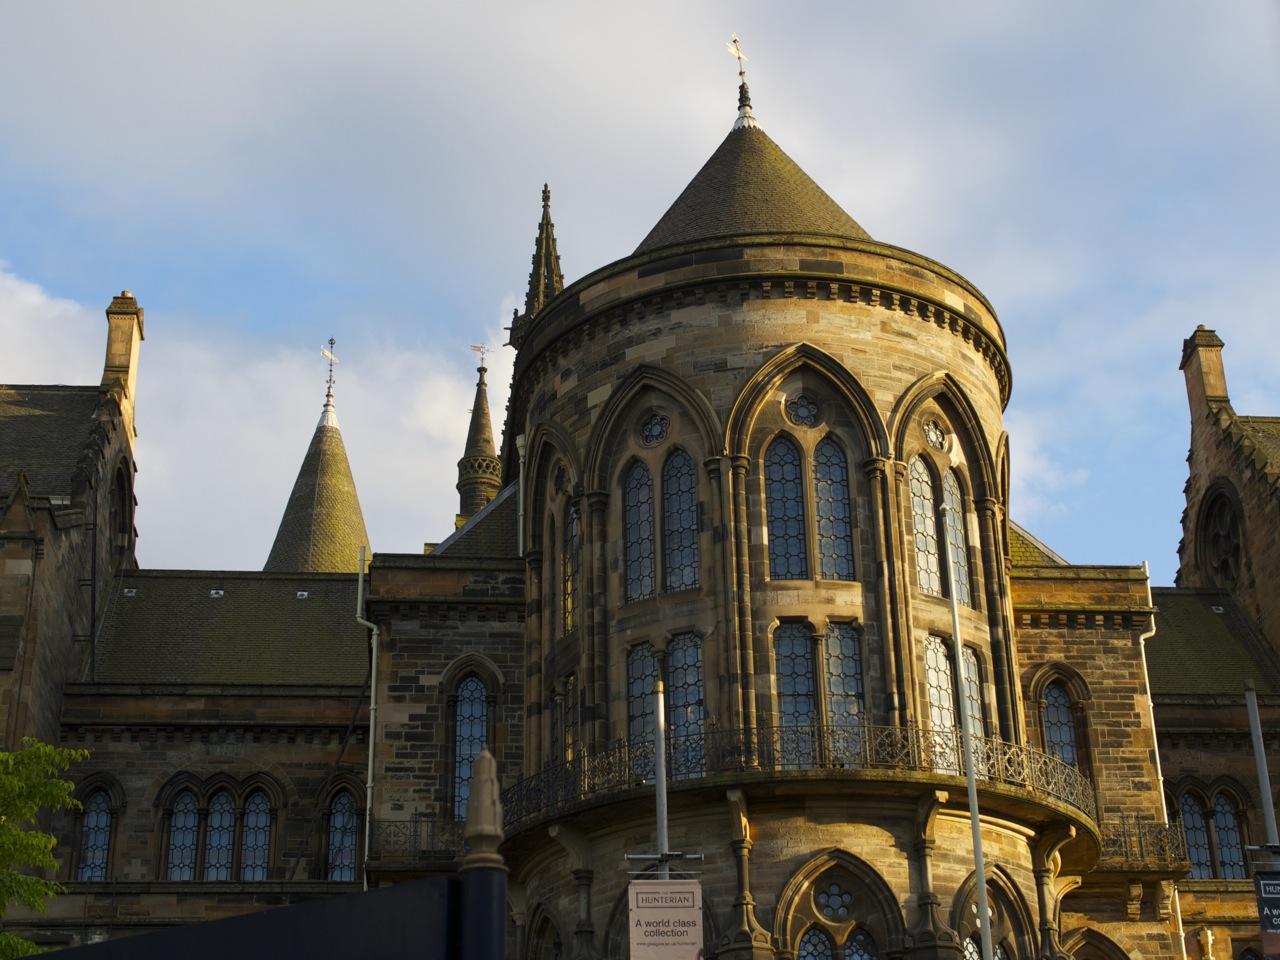 University of Glasgow Main Building